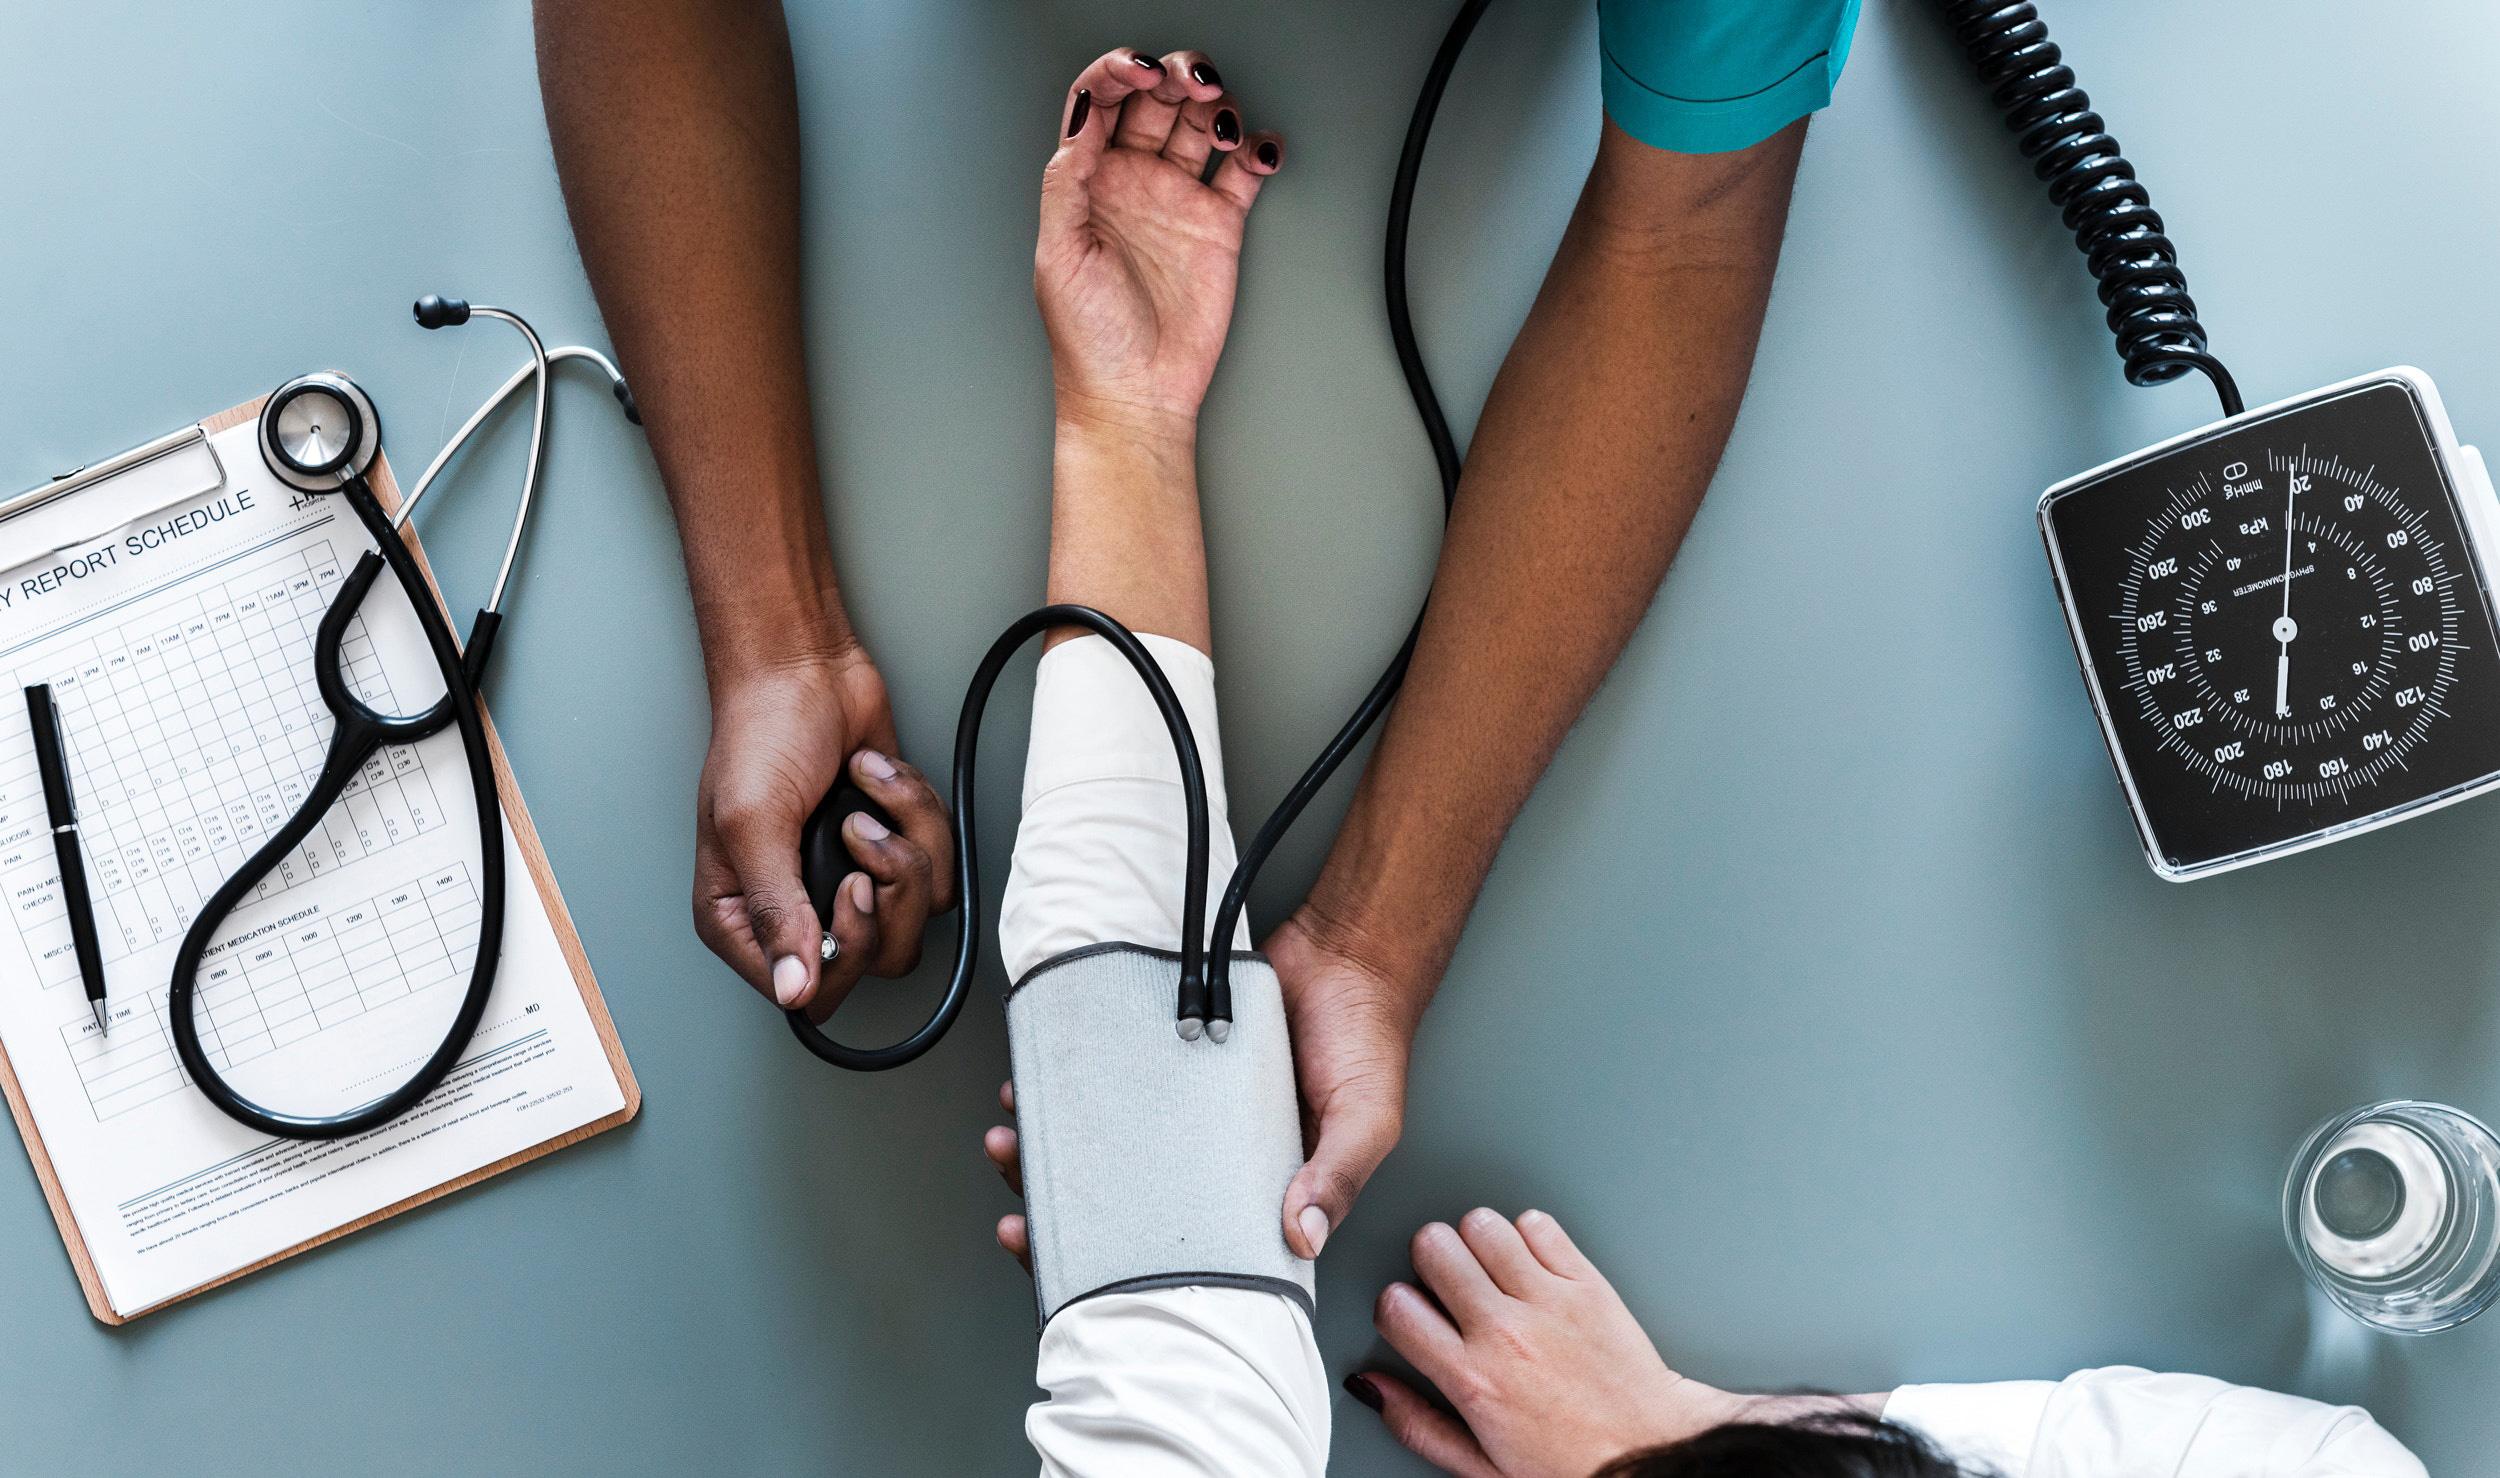 healthcare00004.jpg